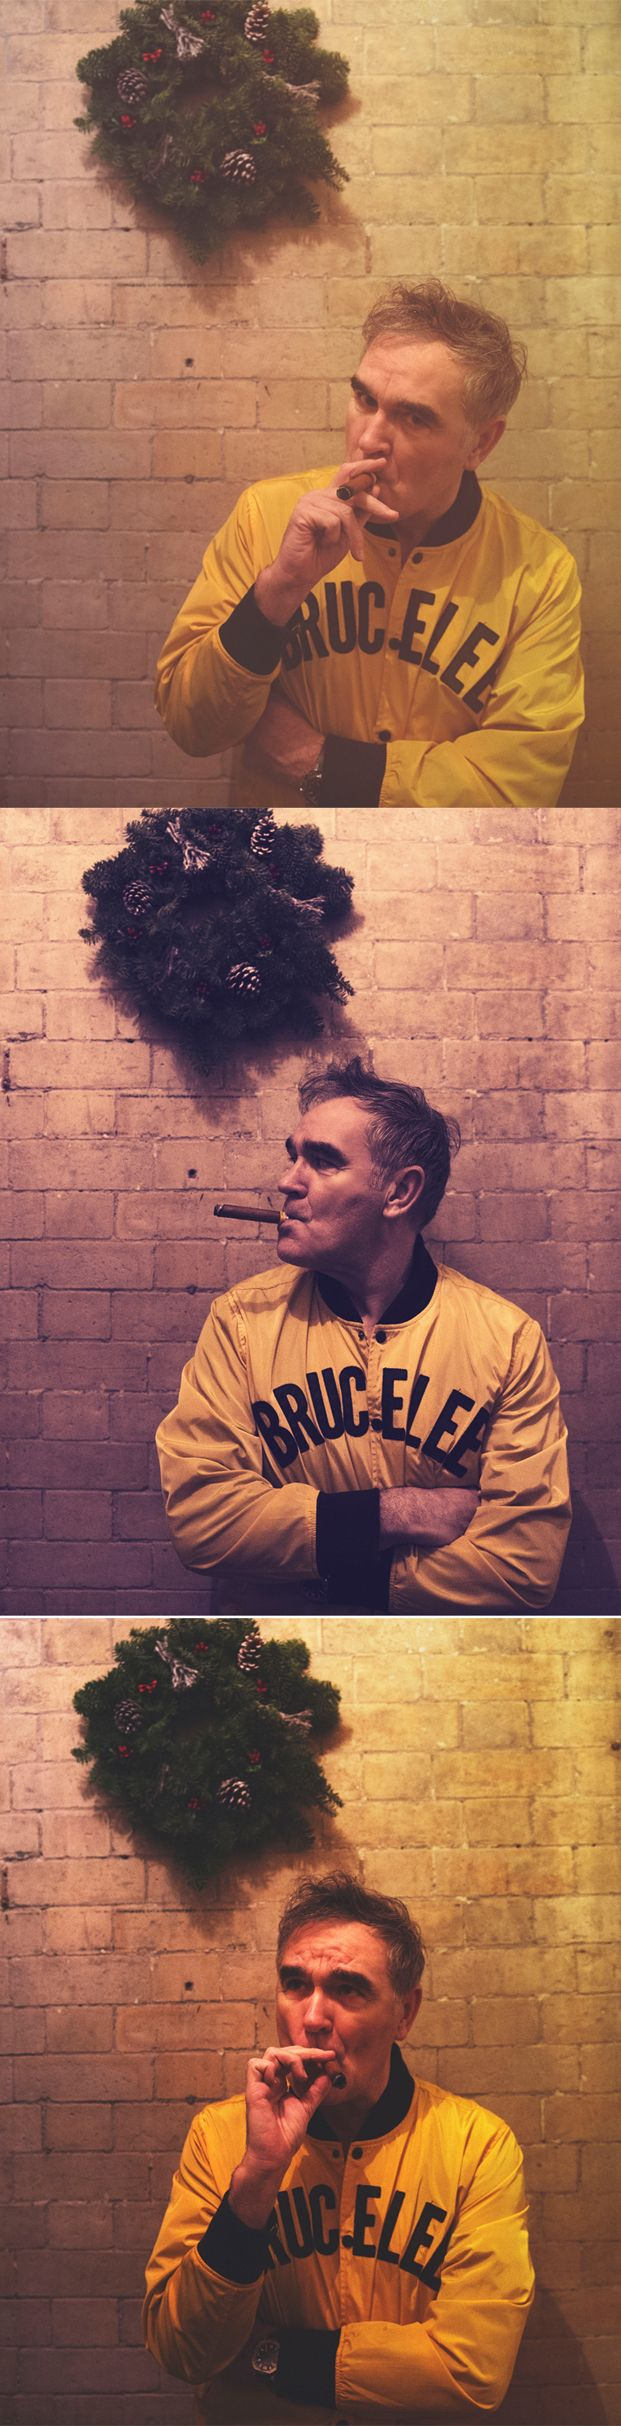 Morrissey (Christmas 2016) – photos by Sam Esty Rayner